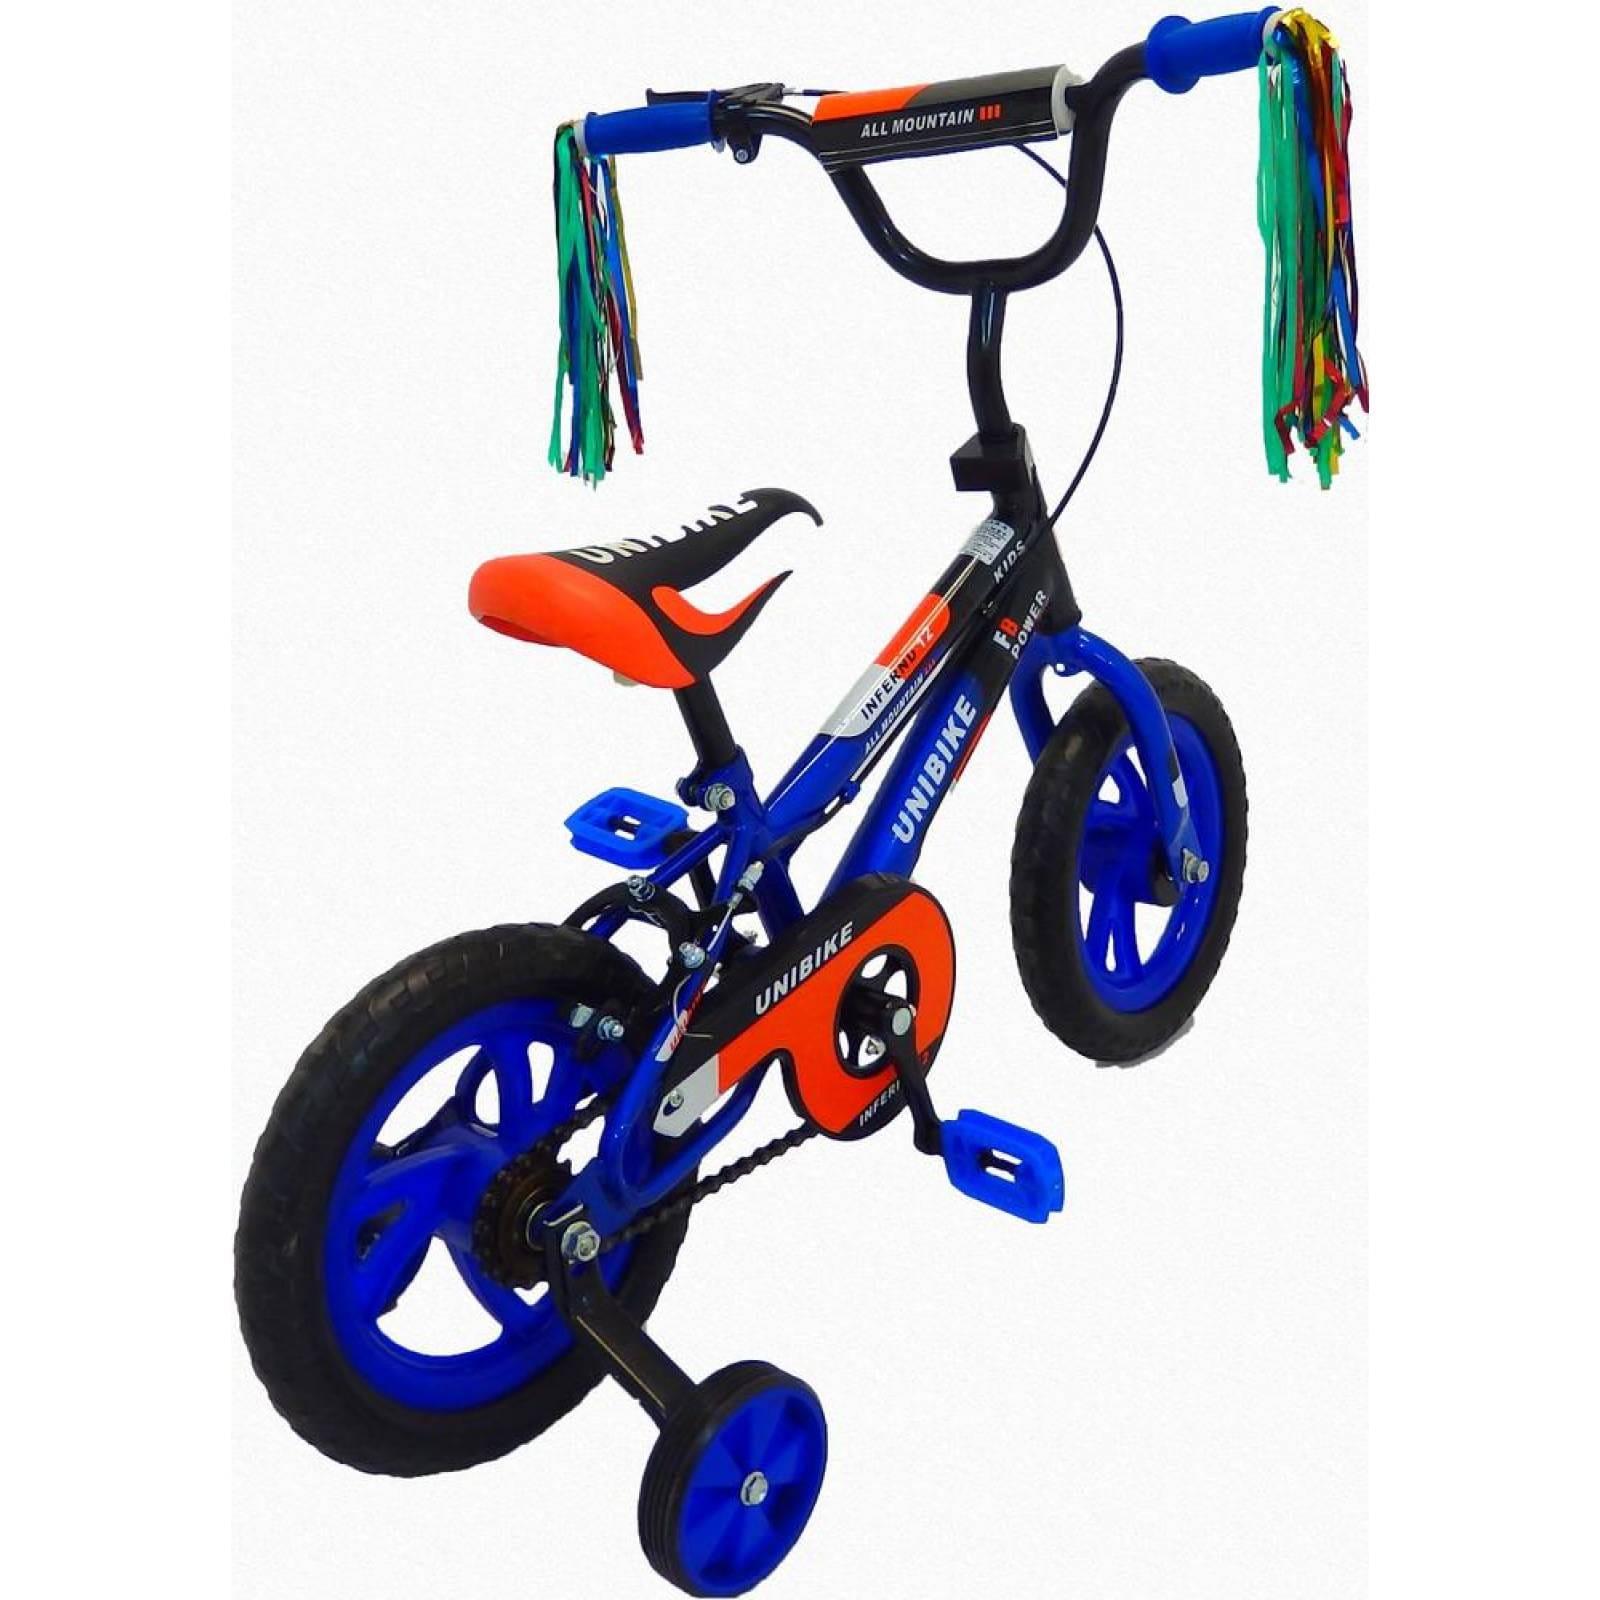 Bicicleta Infantil para niño Rodada 12 con llanta de goma NegroAzul